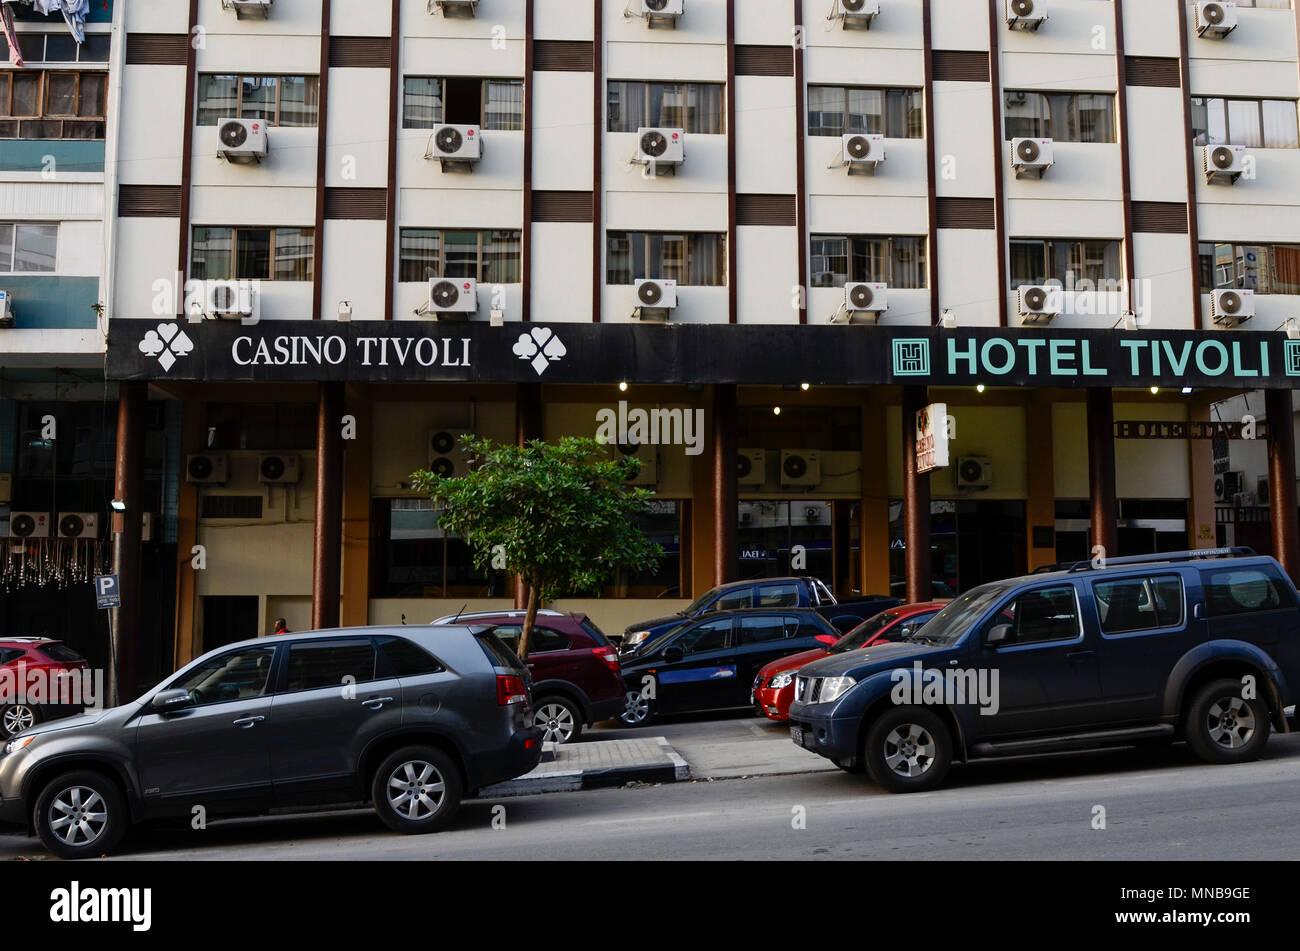 ANGOLA Luanda, Hotel Tivoli - Stock Image